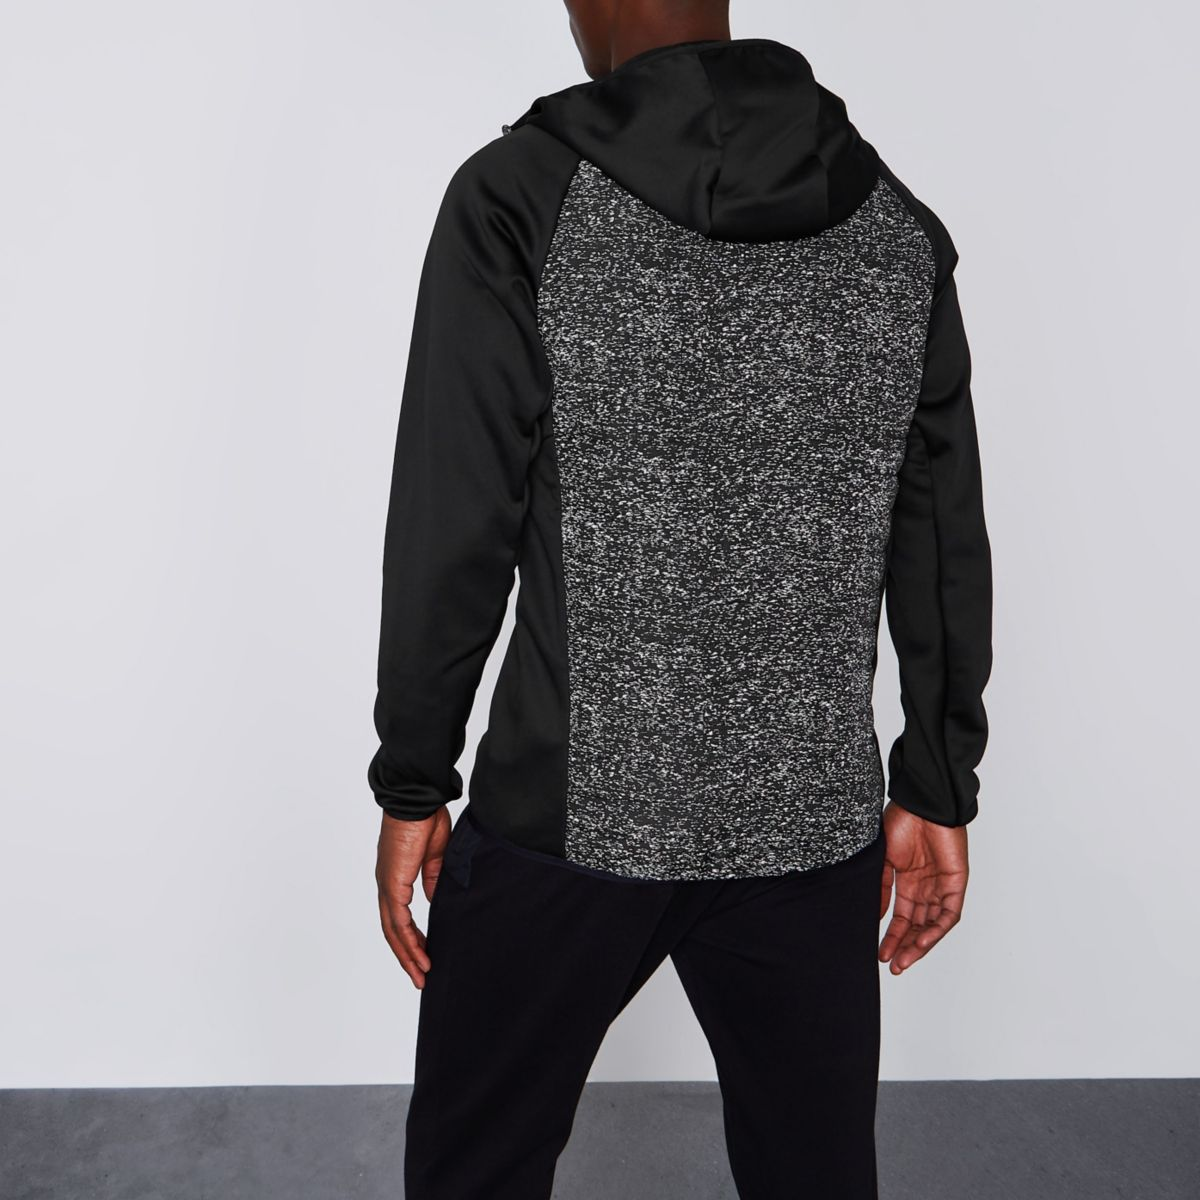 black Jack amp; scuba Core hoodie Jones sleeve wwZ16